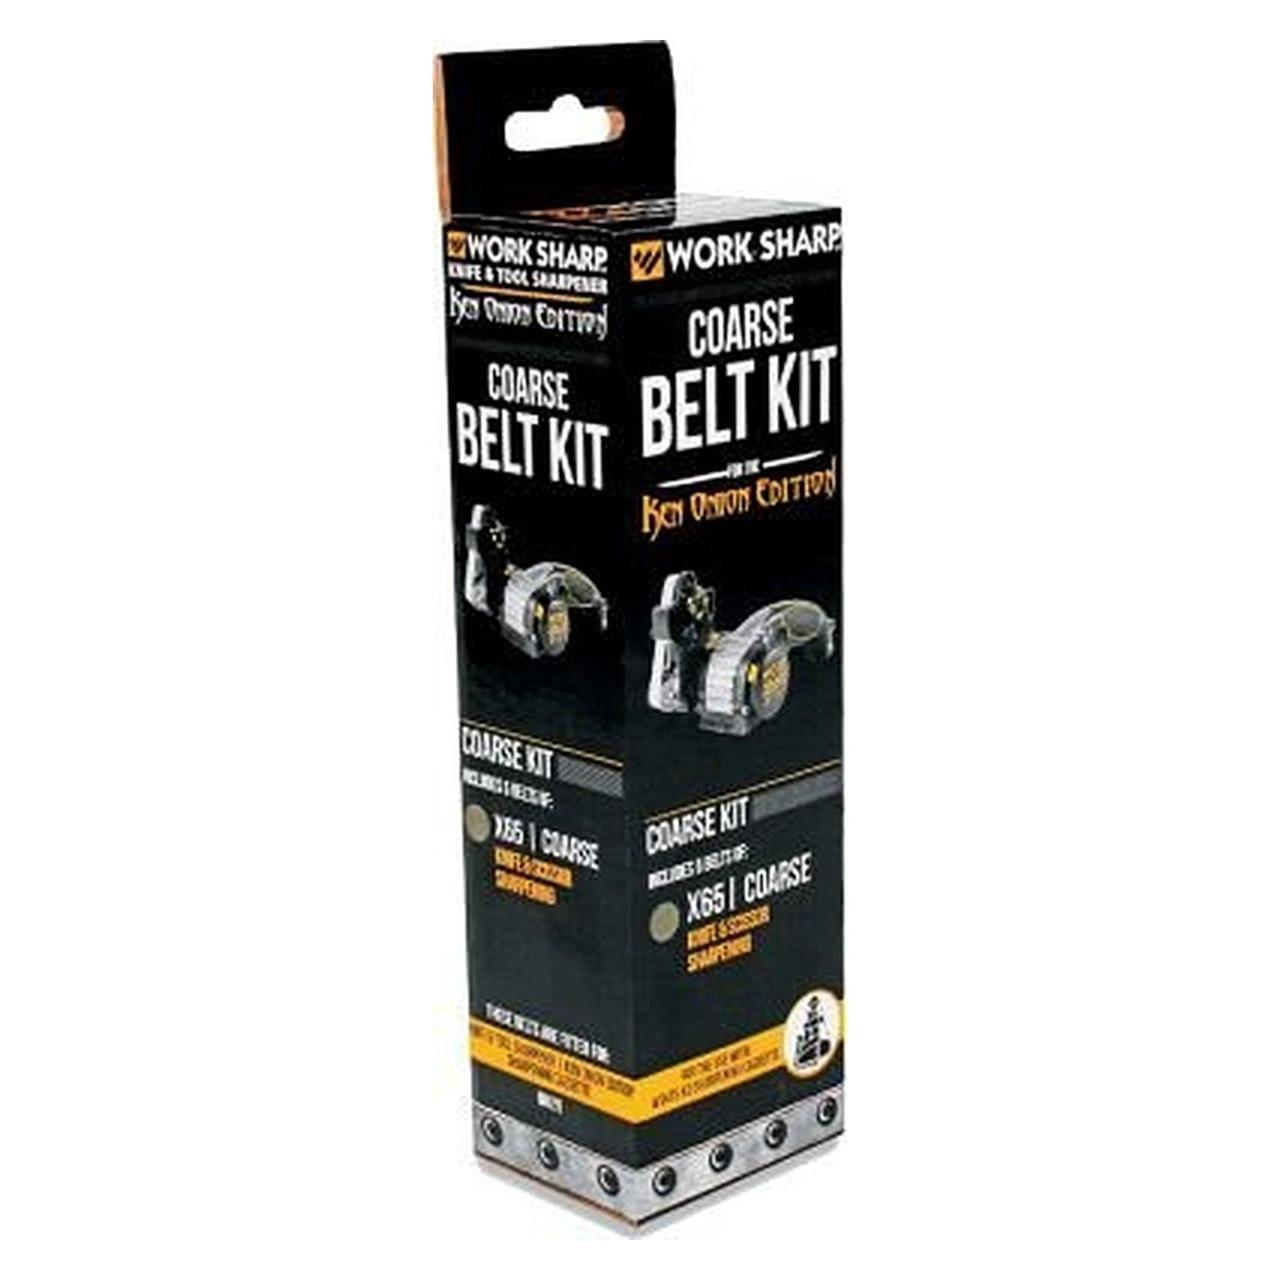 Work Sharp Набір змінних ременів 5шт Belt Kit for X65 Coarse PP0003206